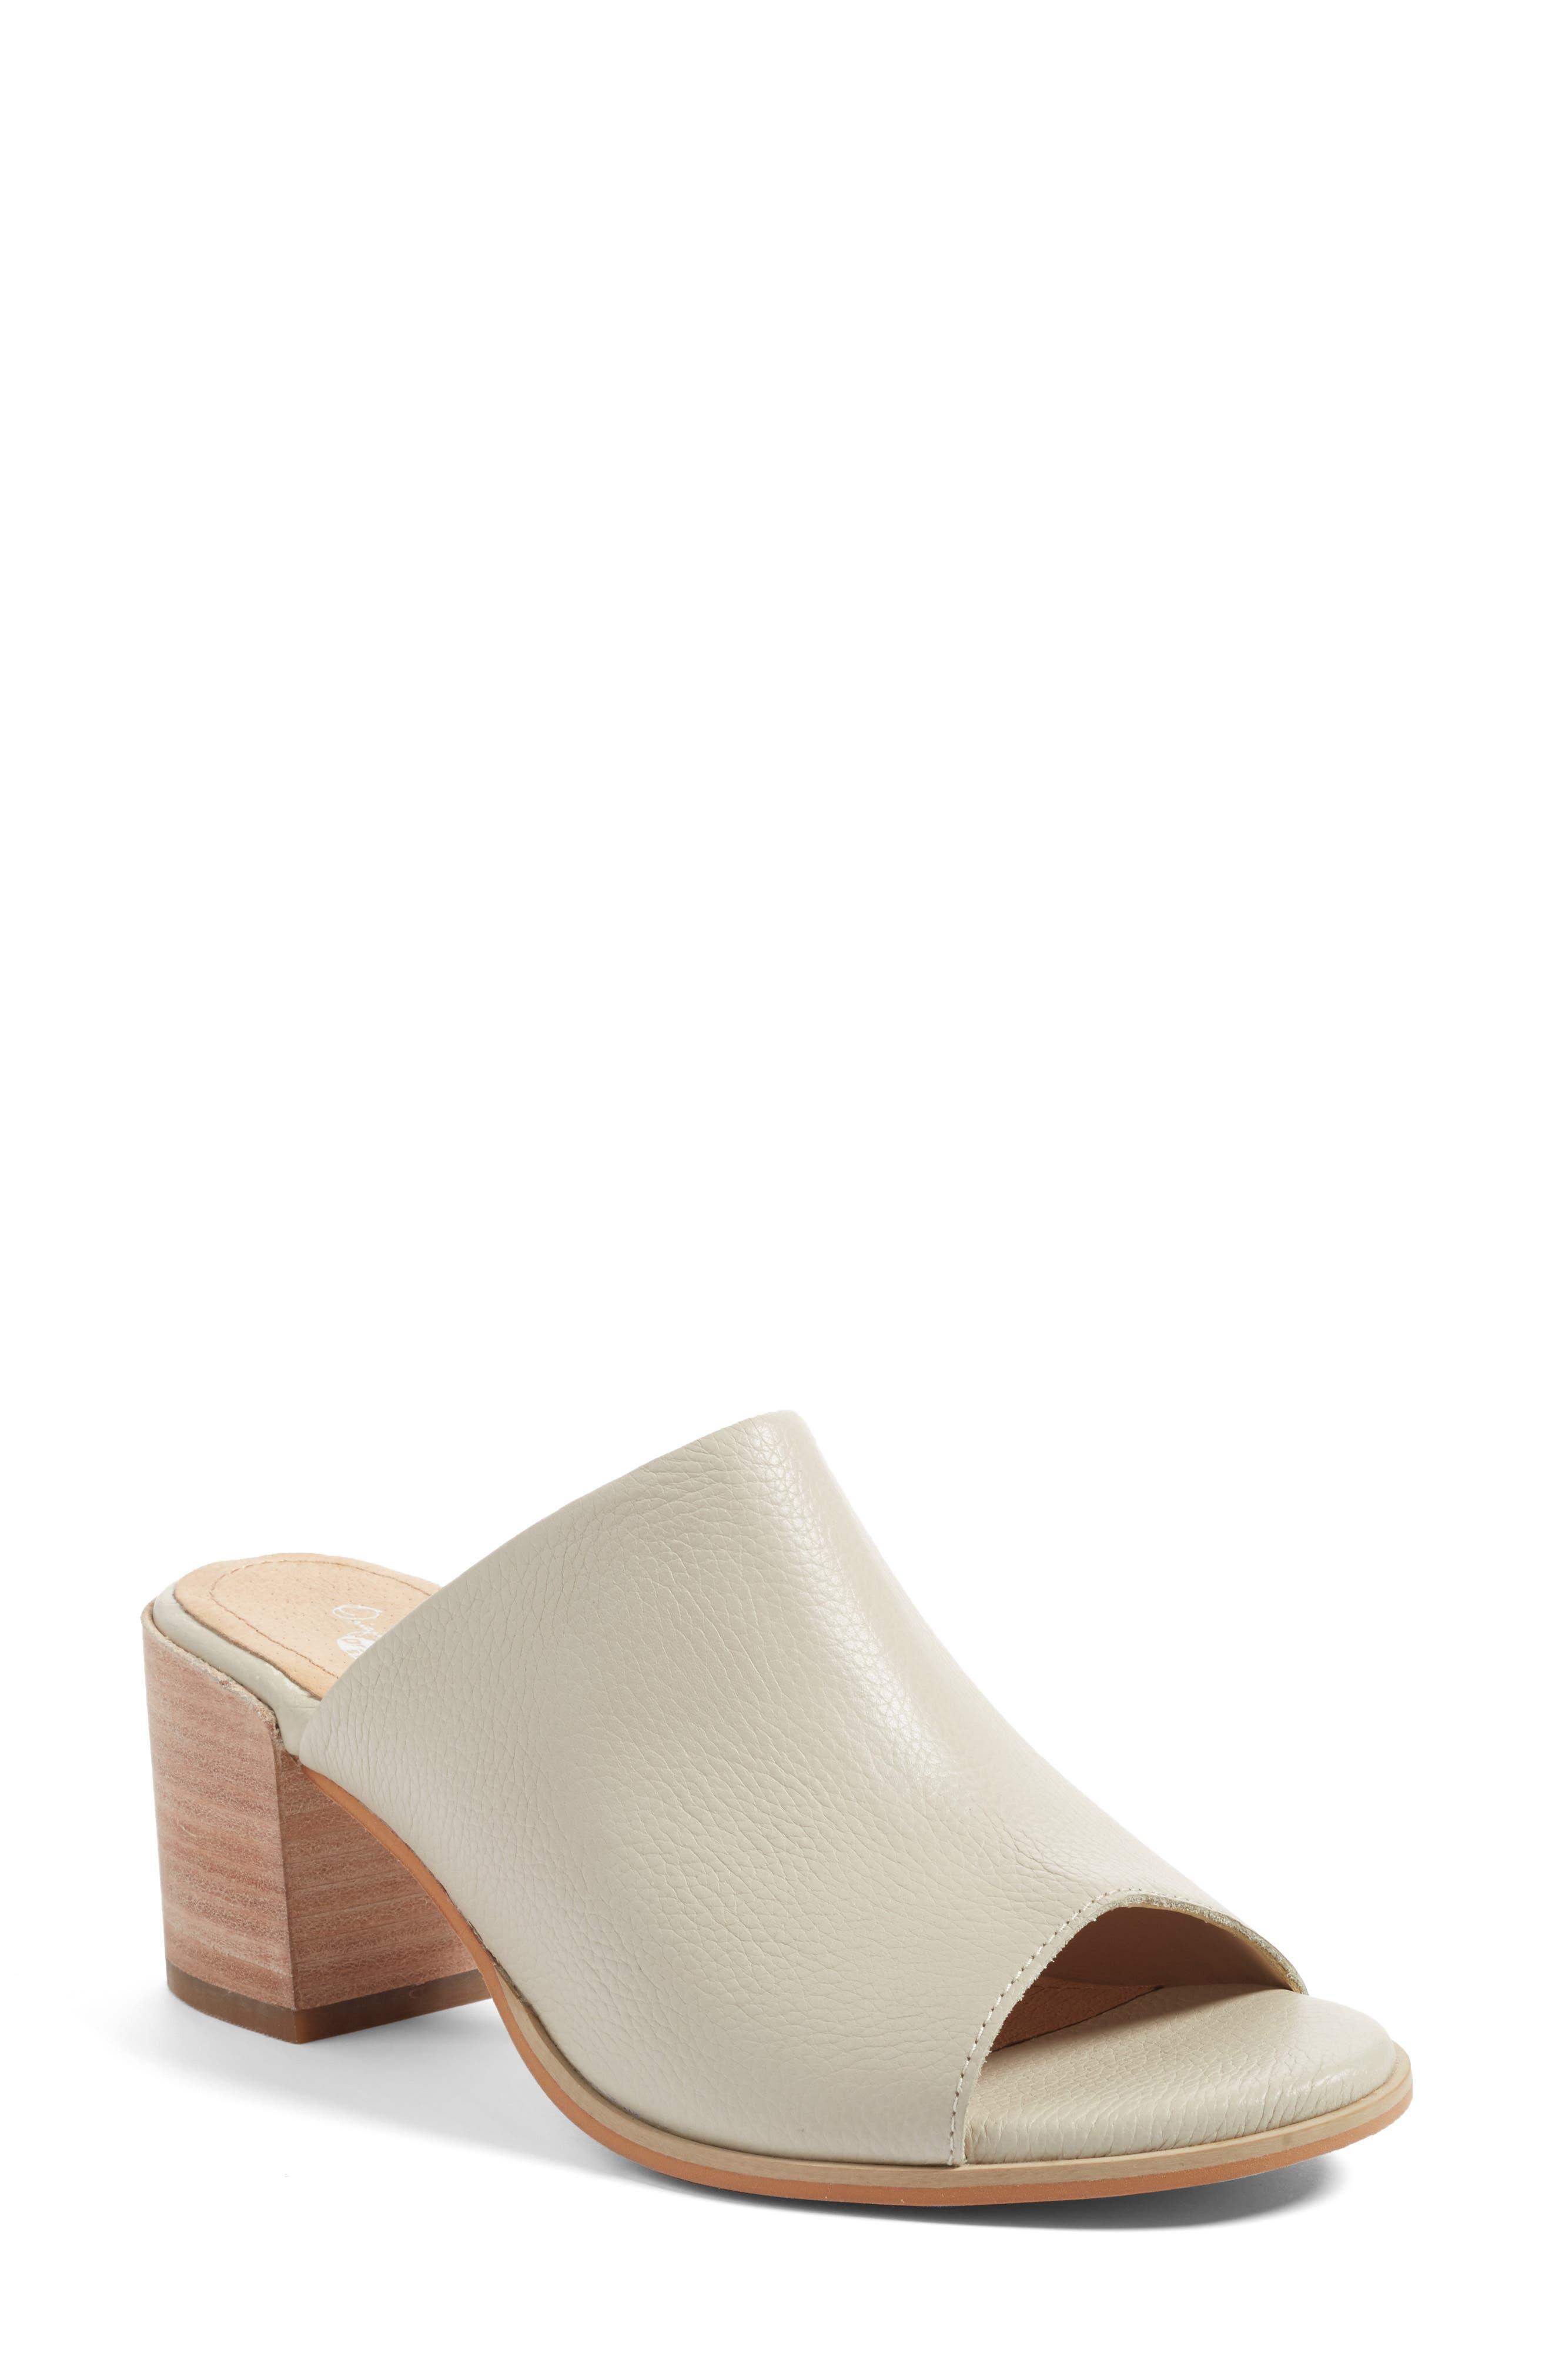 Main Image - Dr. Scholl's Malin Block Heel Sandal (Women)